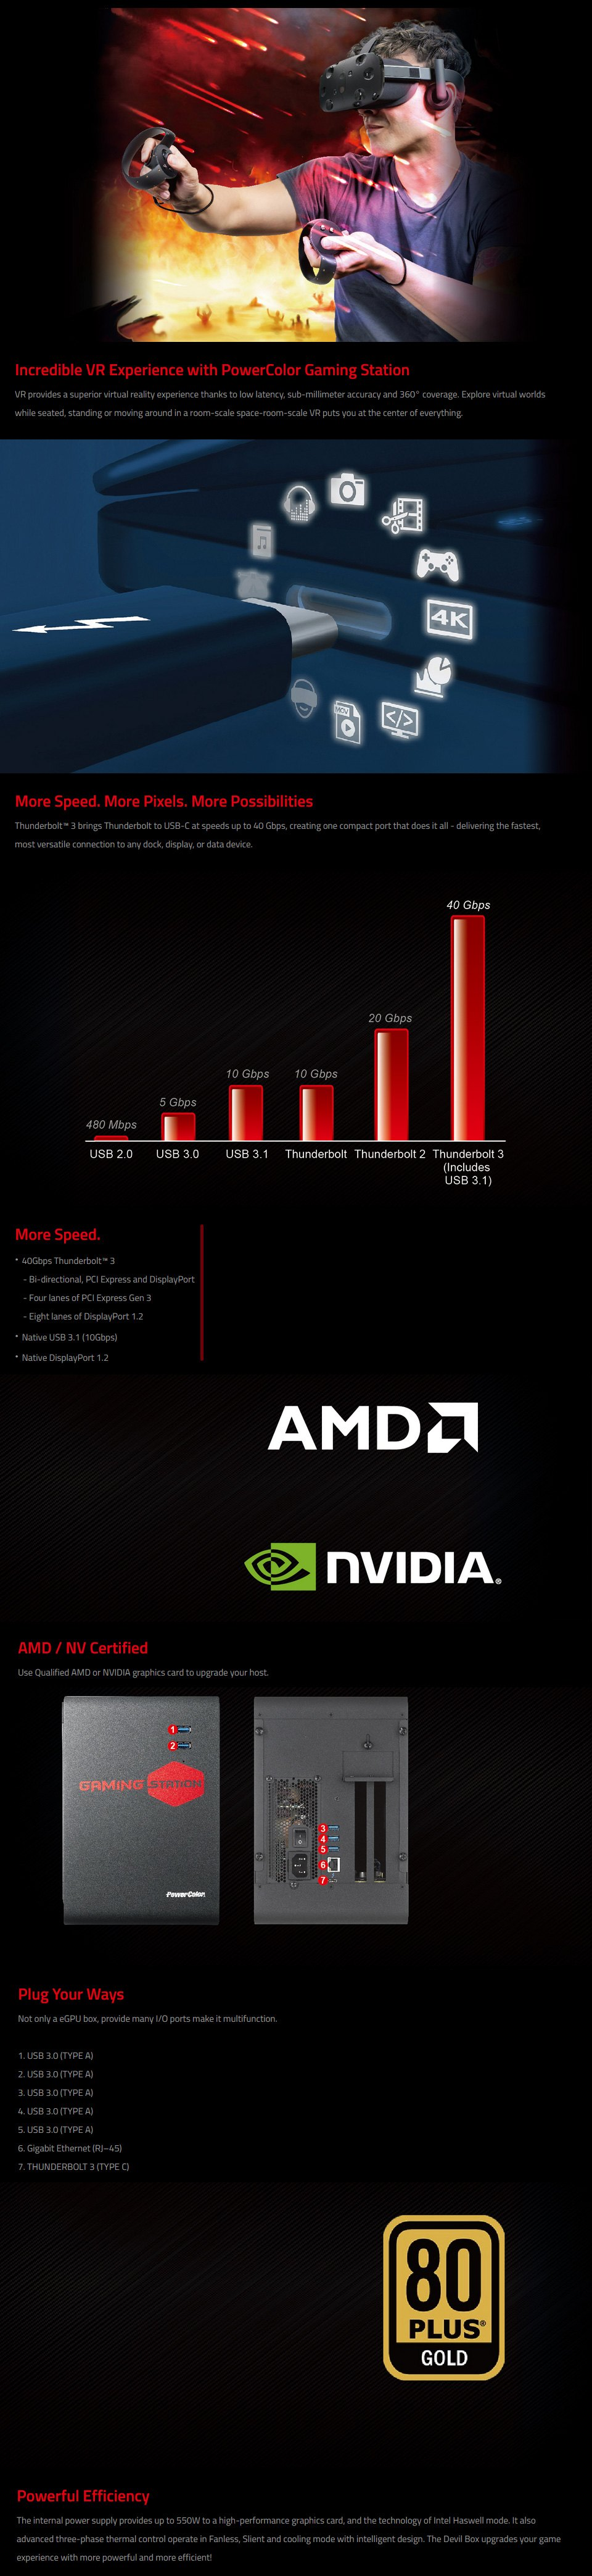 PowerColor Gaming Station ThunderBolt 3 GPU Enclosure features 2